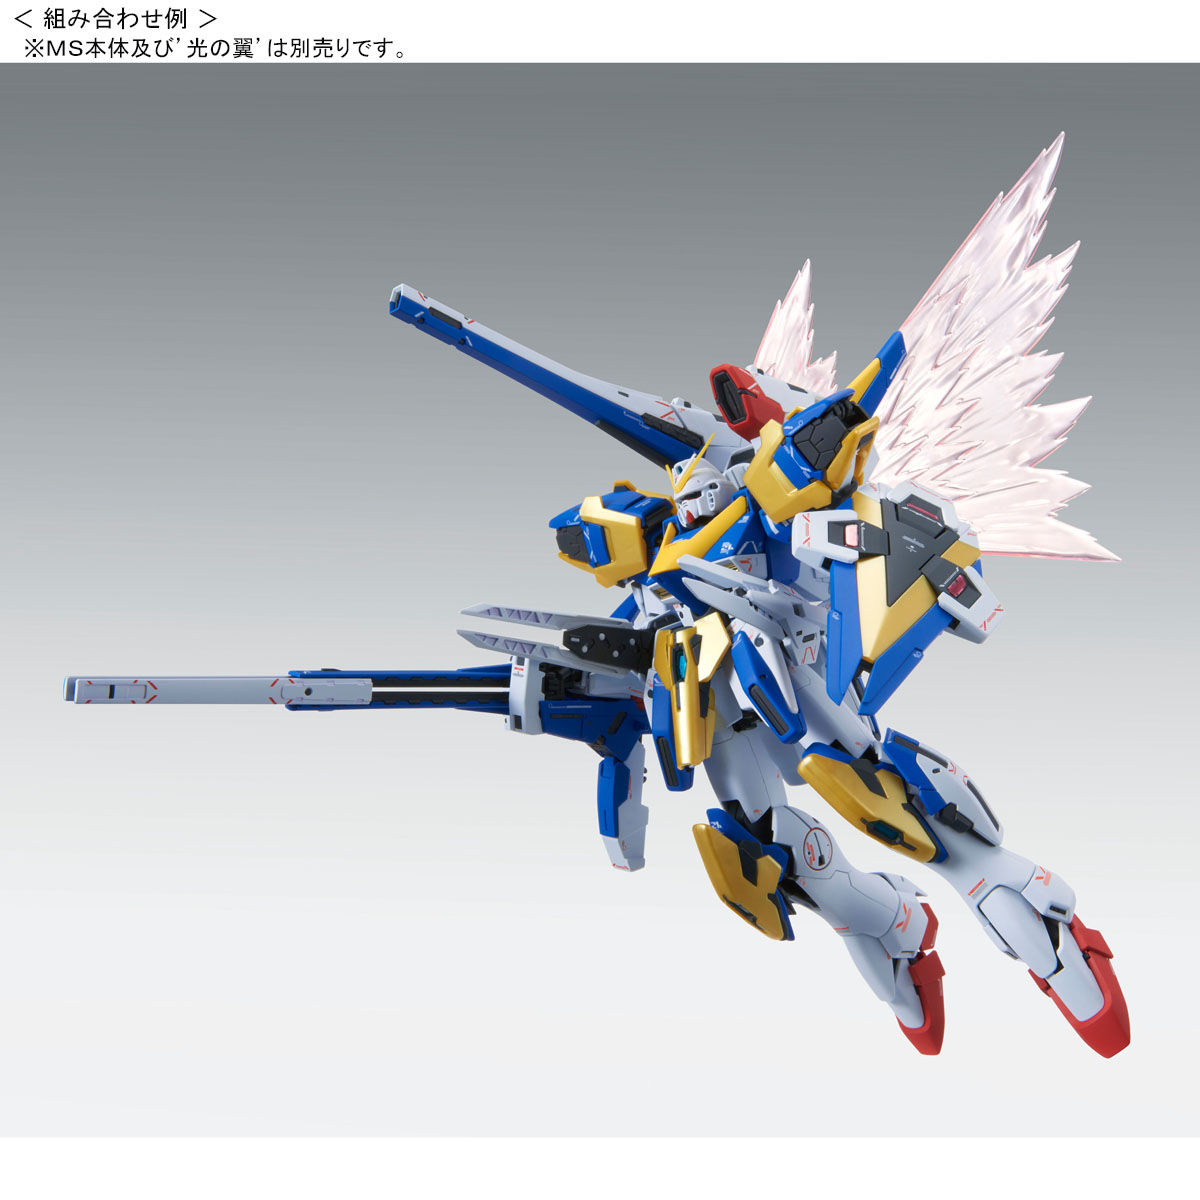 P-Bandai: MG 1/100 V2 Assault Buster Gundam Ver. Ka [Expansion Set] - Release Info - Gundam Kits Collection News and Reviews